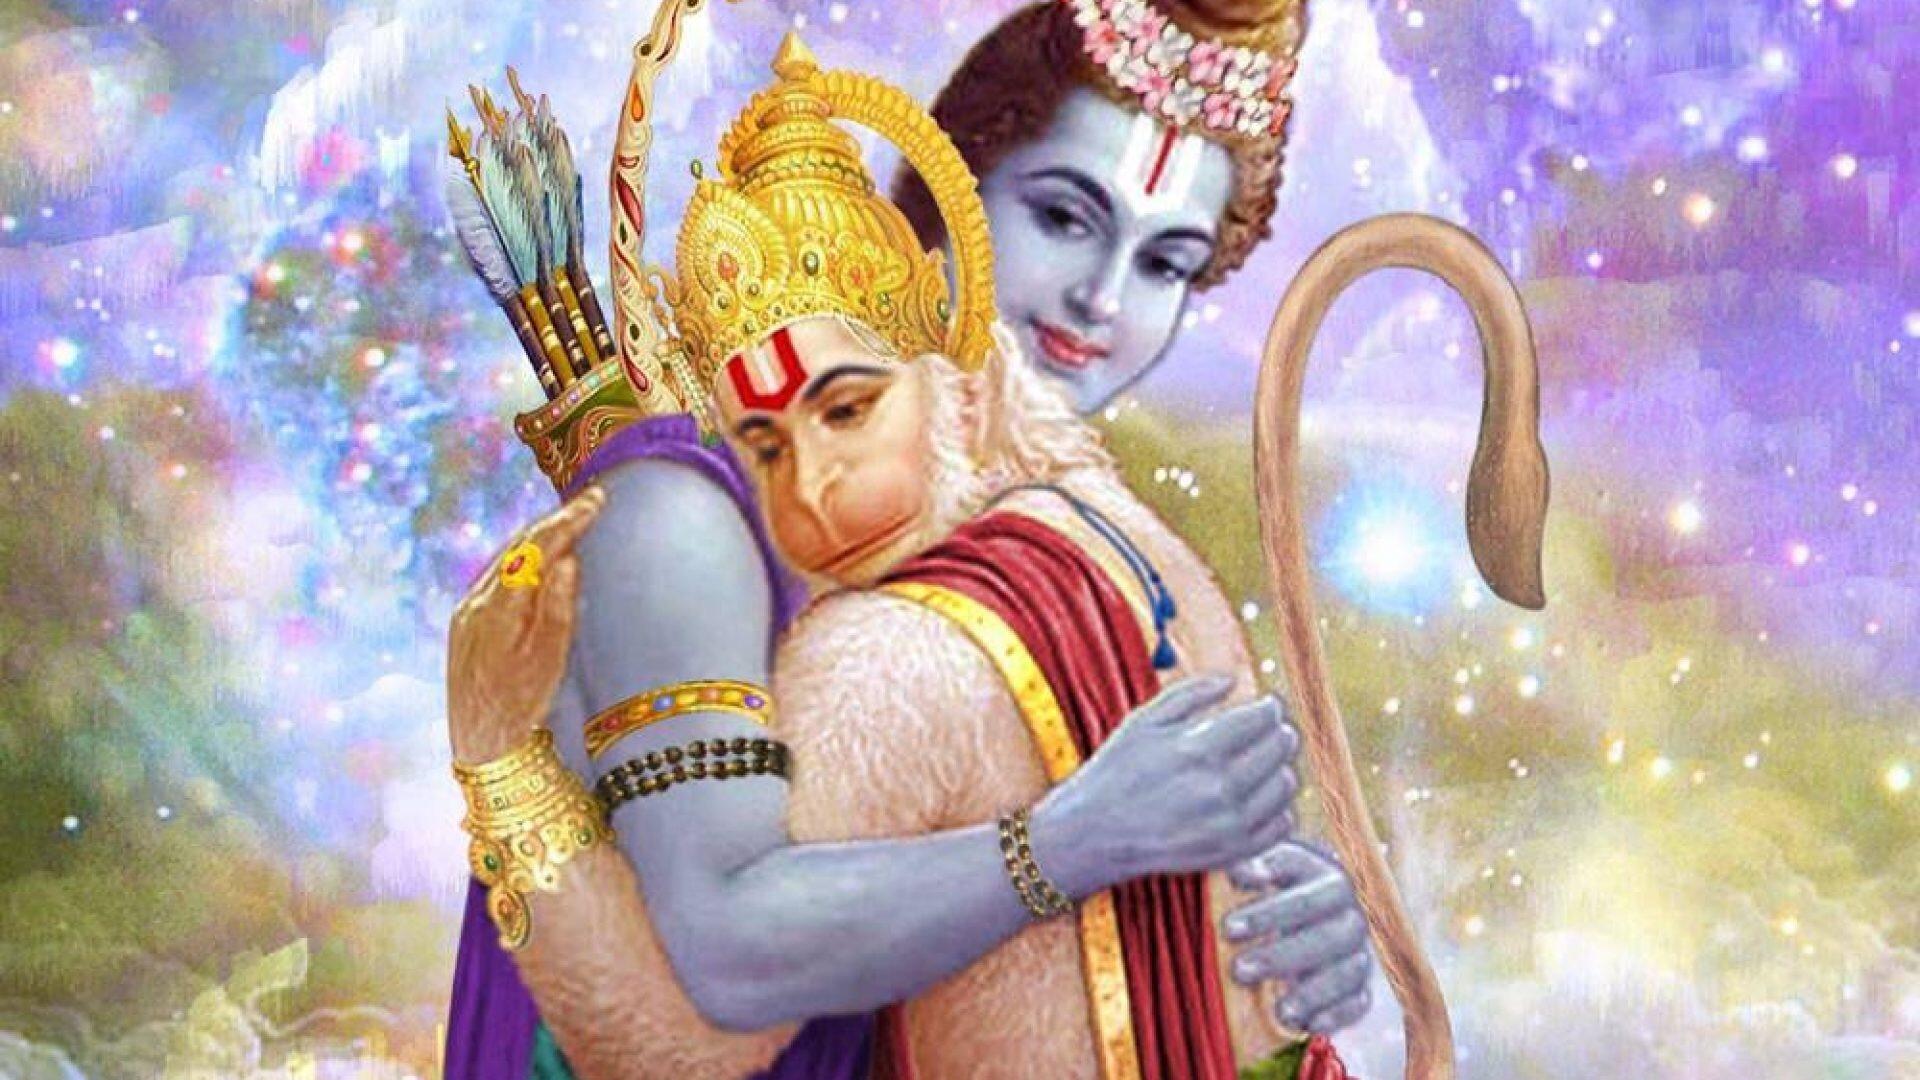 God Hanuman With Ram